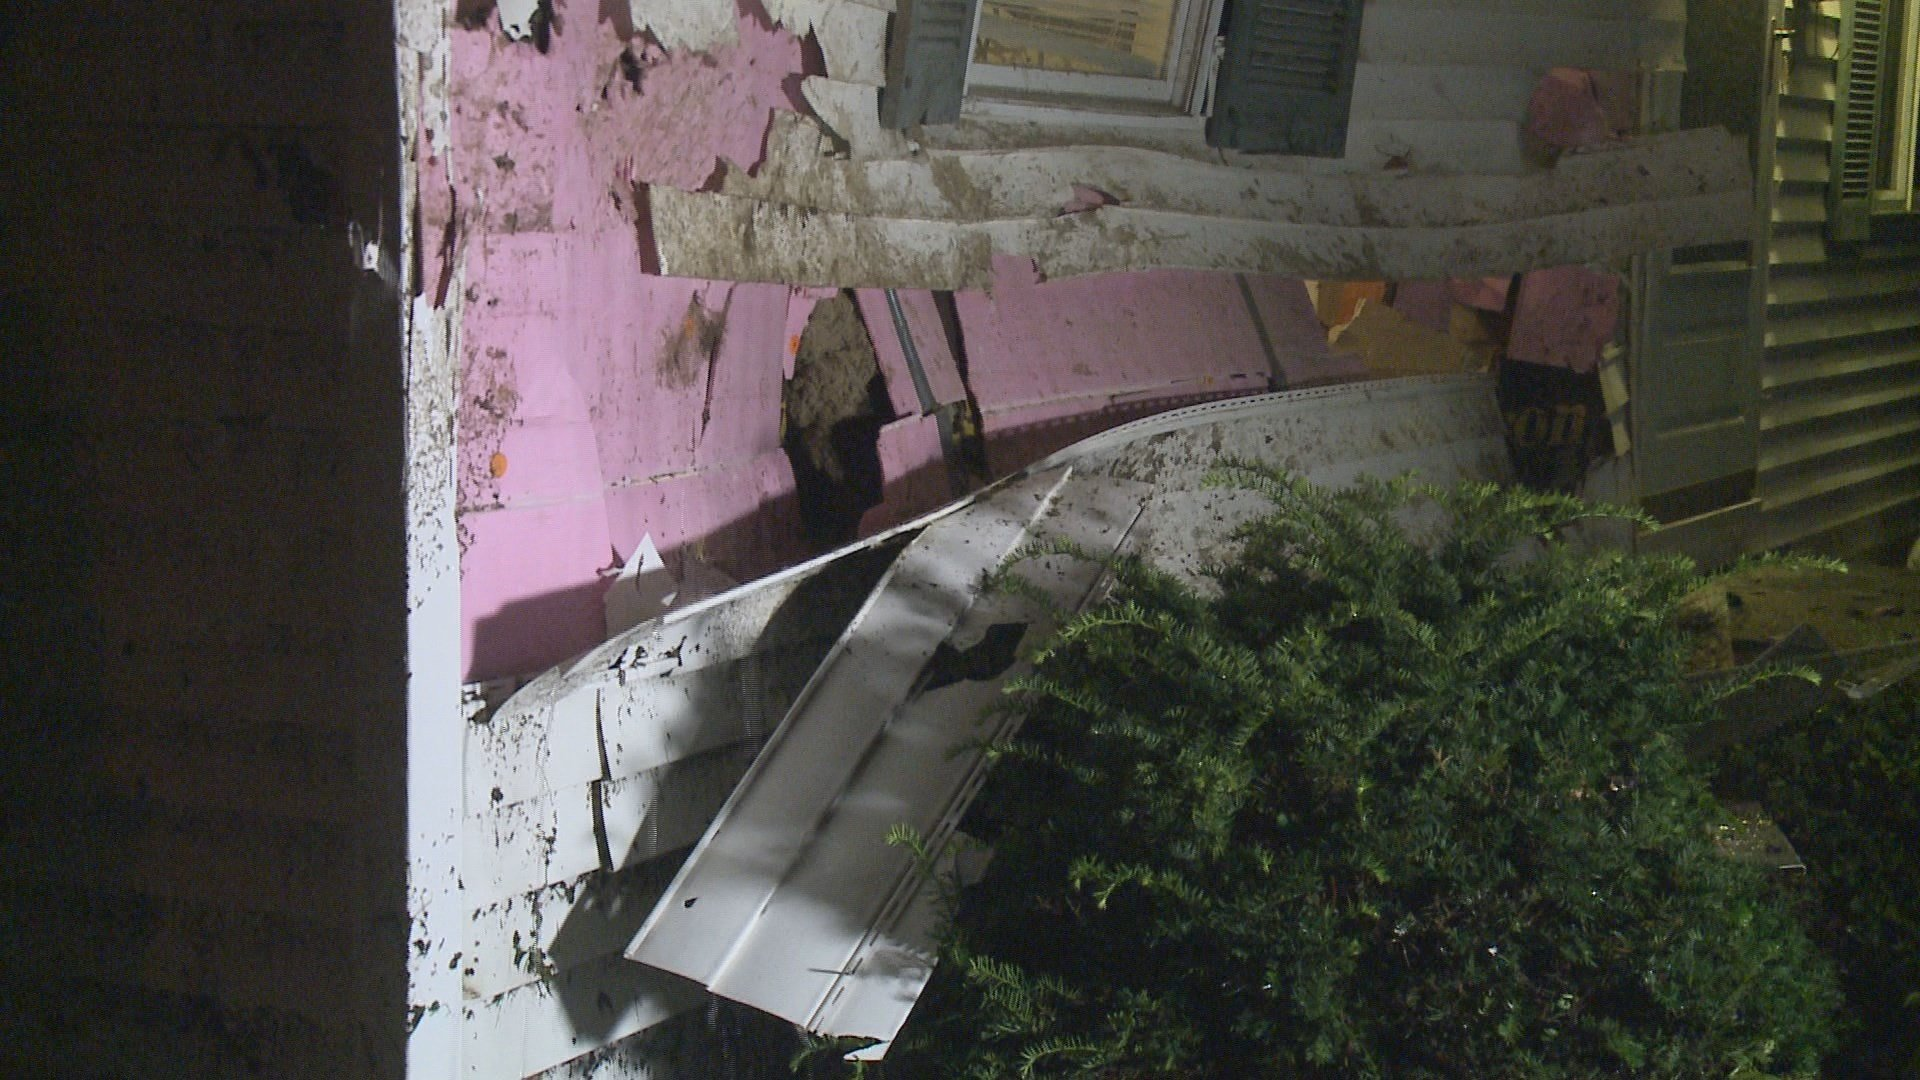 Damage on the house